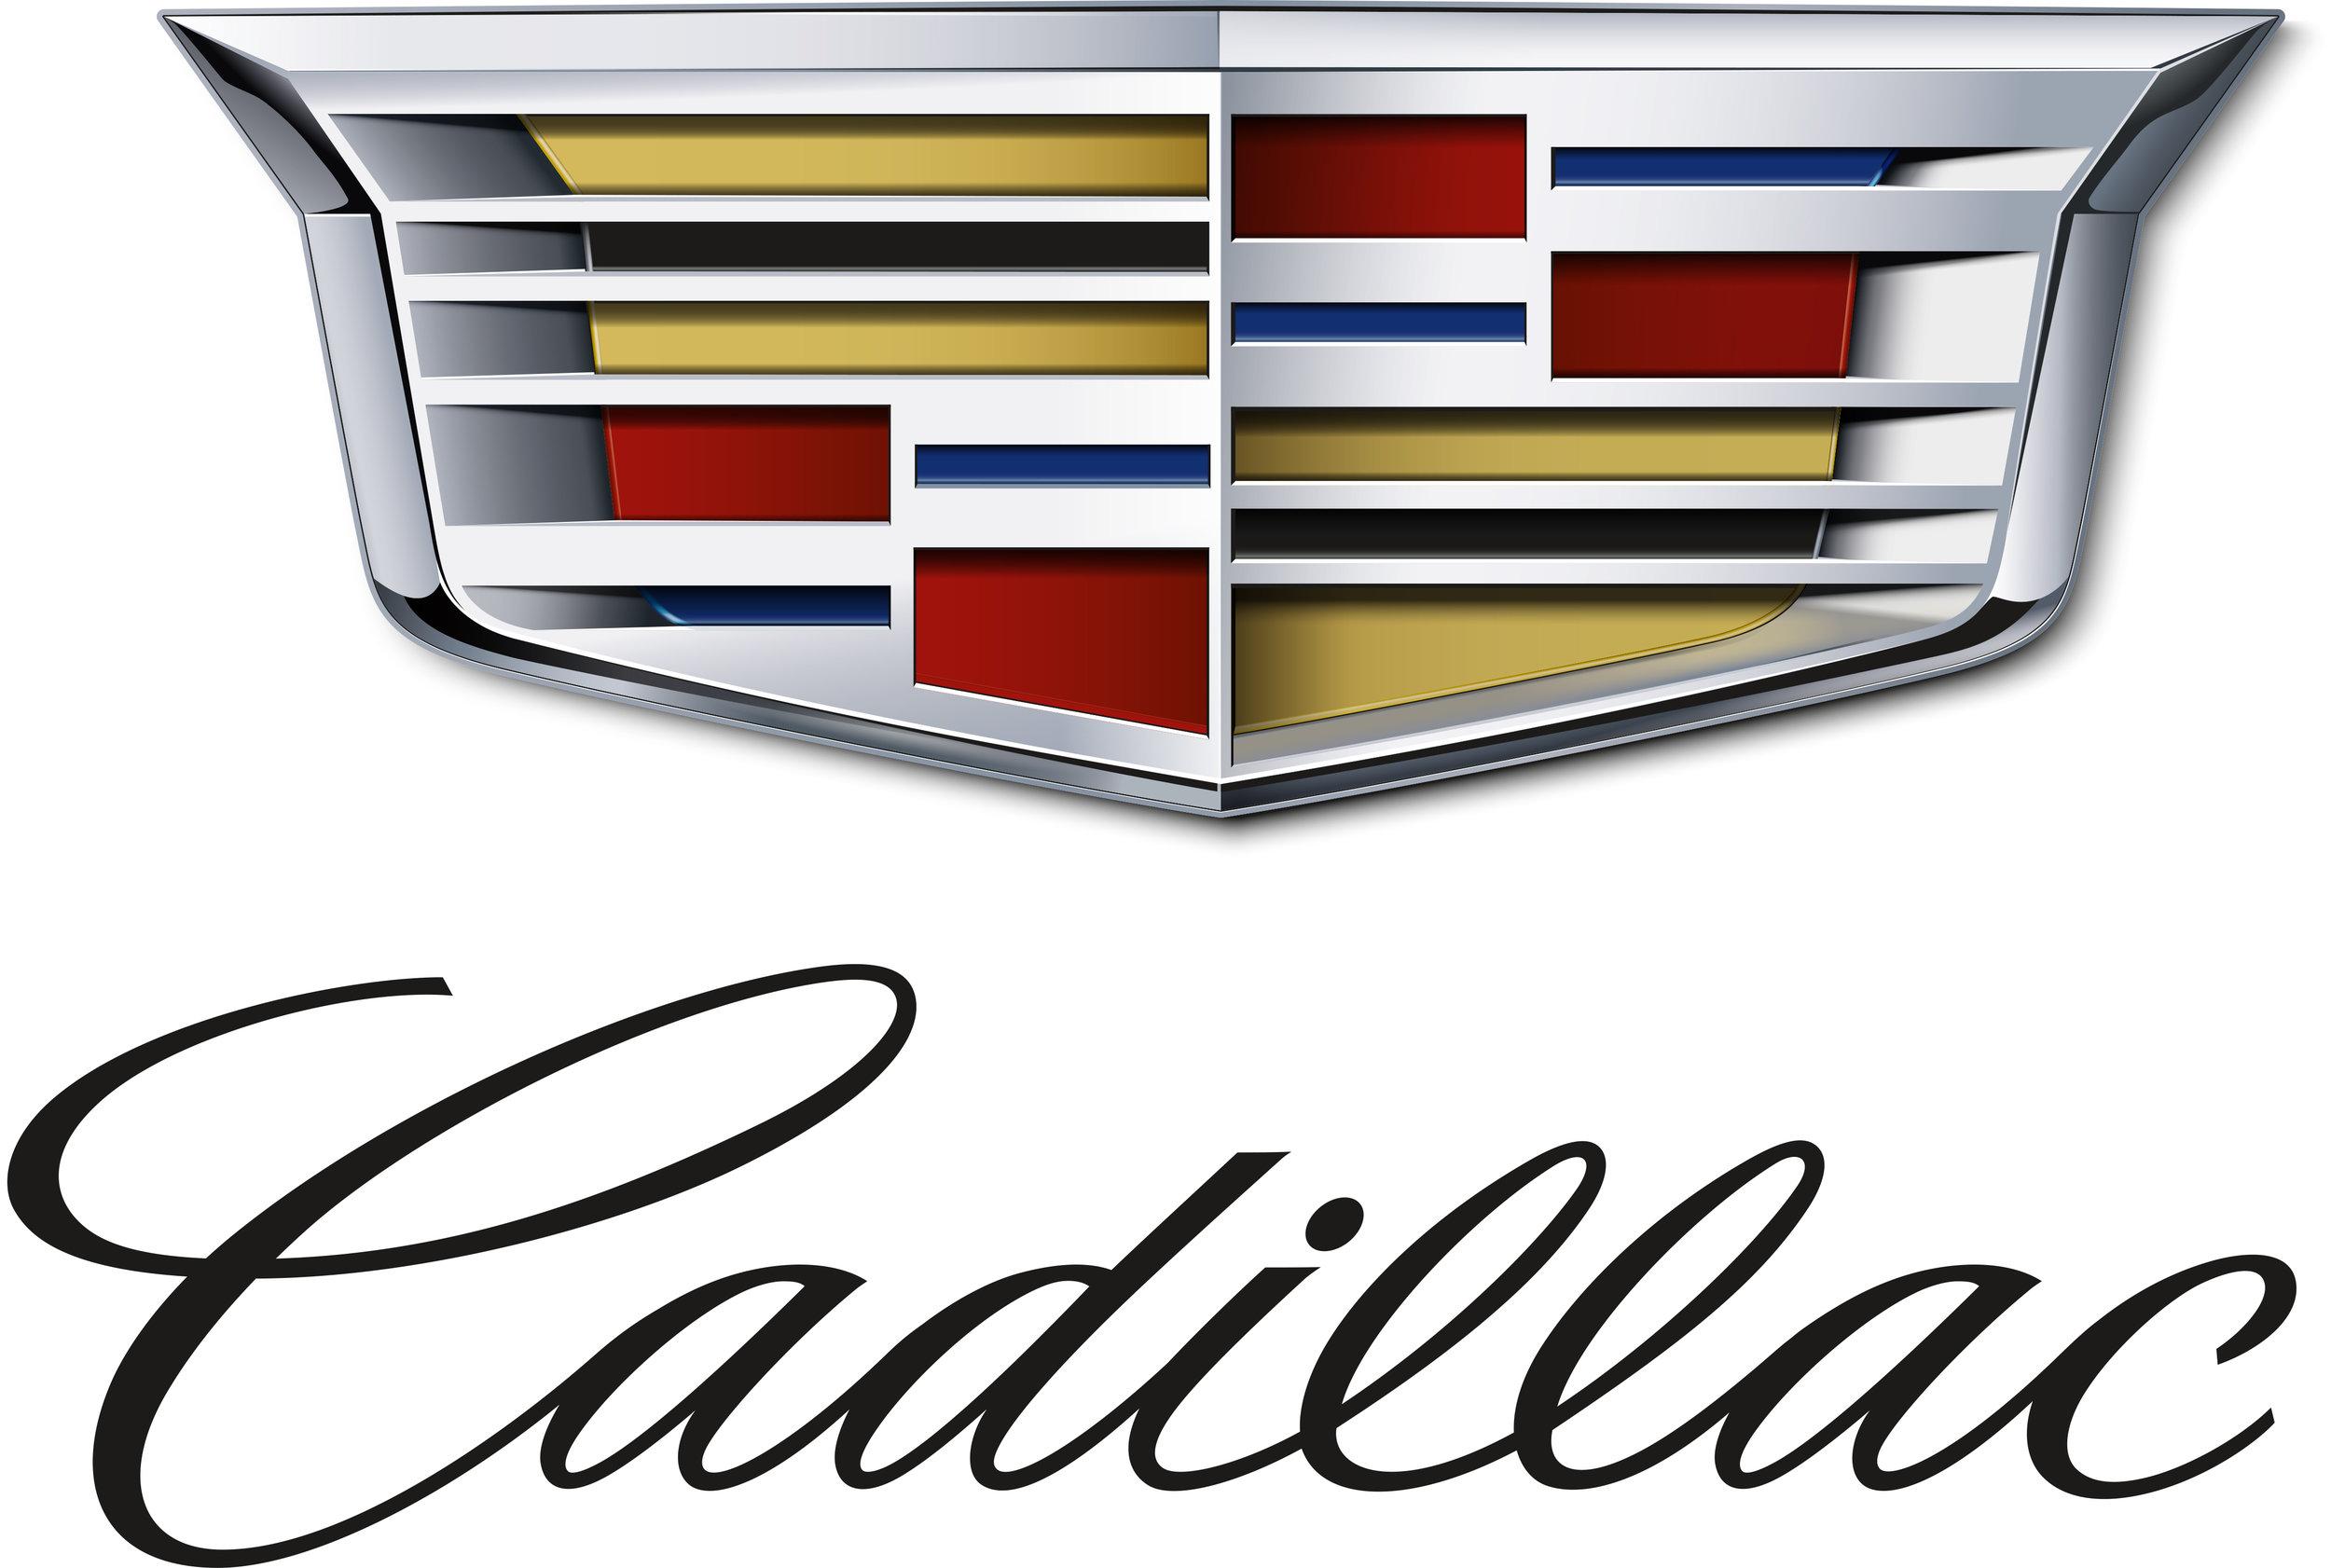 CadillacLogo.jpg